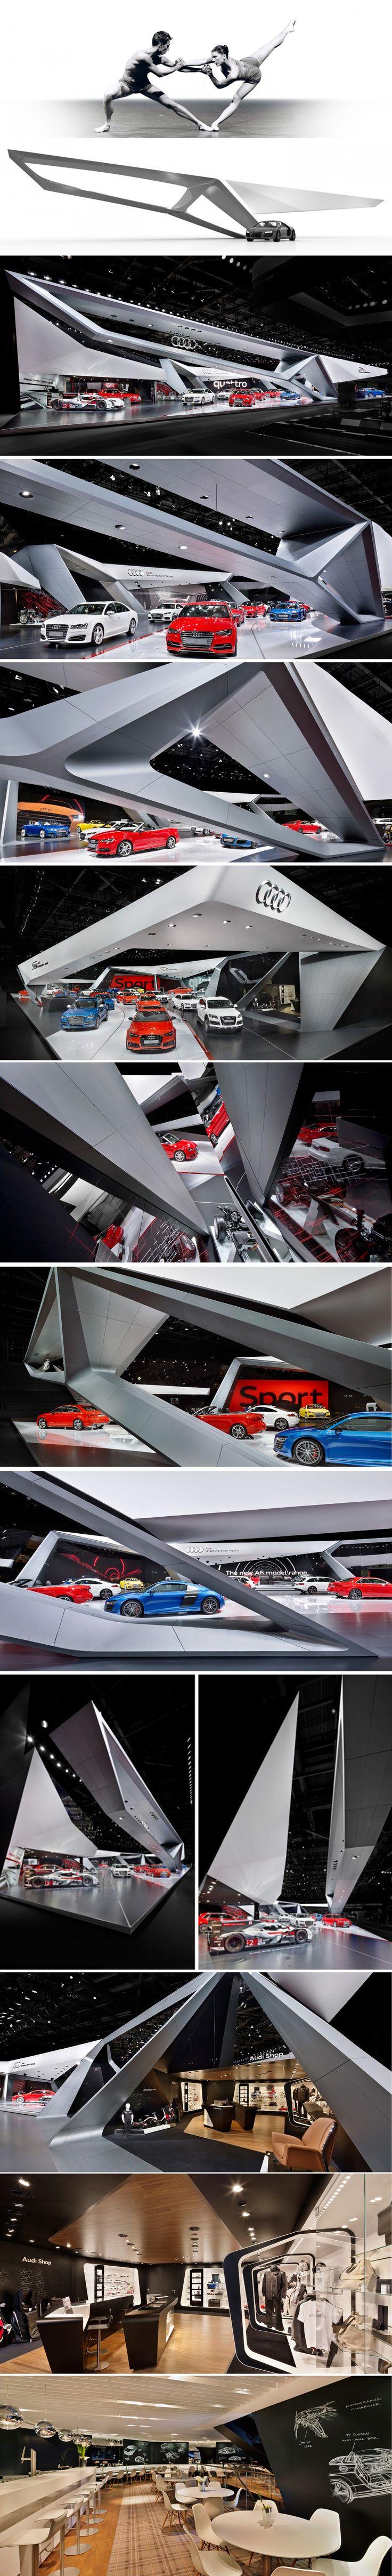 Ux solutions digital art director and motion designer based in noosa - Audi Paris 2014 Schmidhuber Exhibition Design